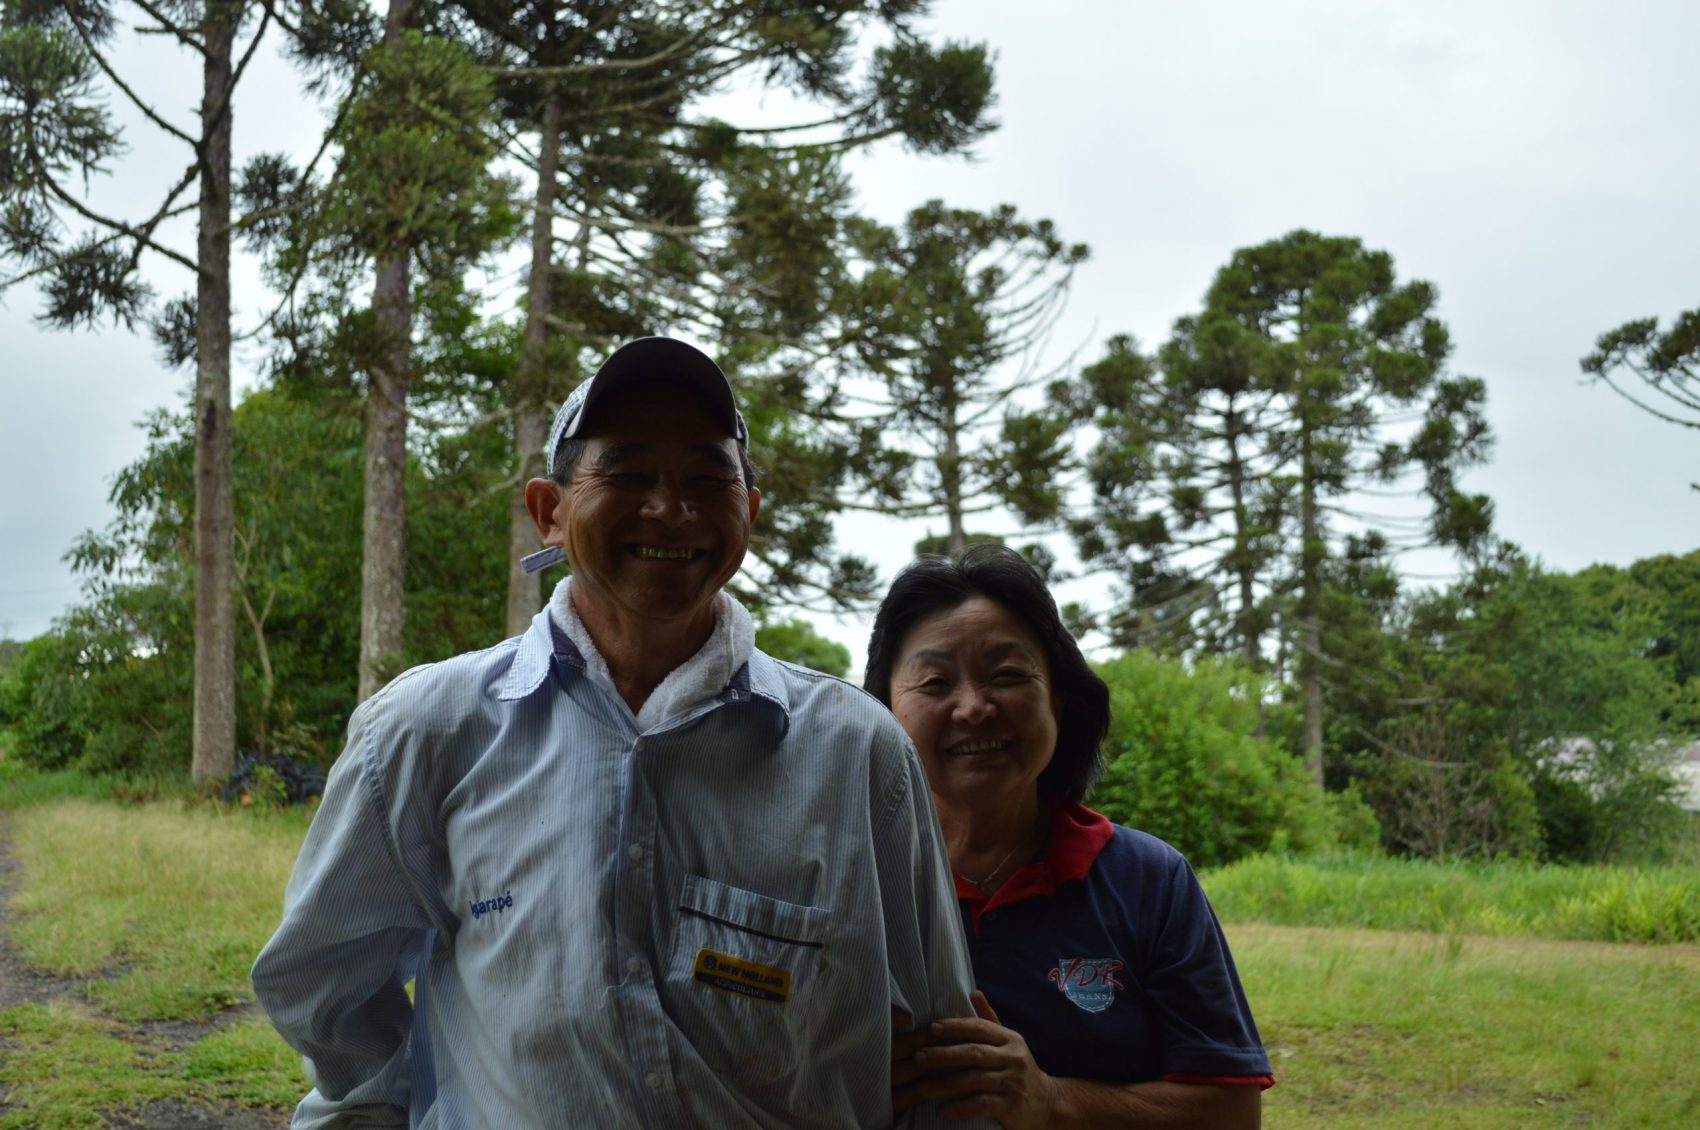 agricultura ecológica - chácara nakui